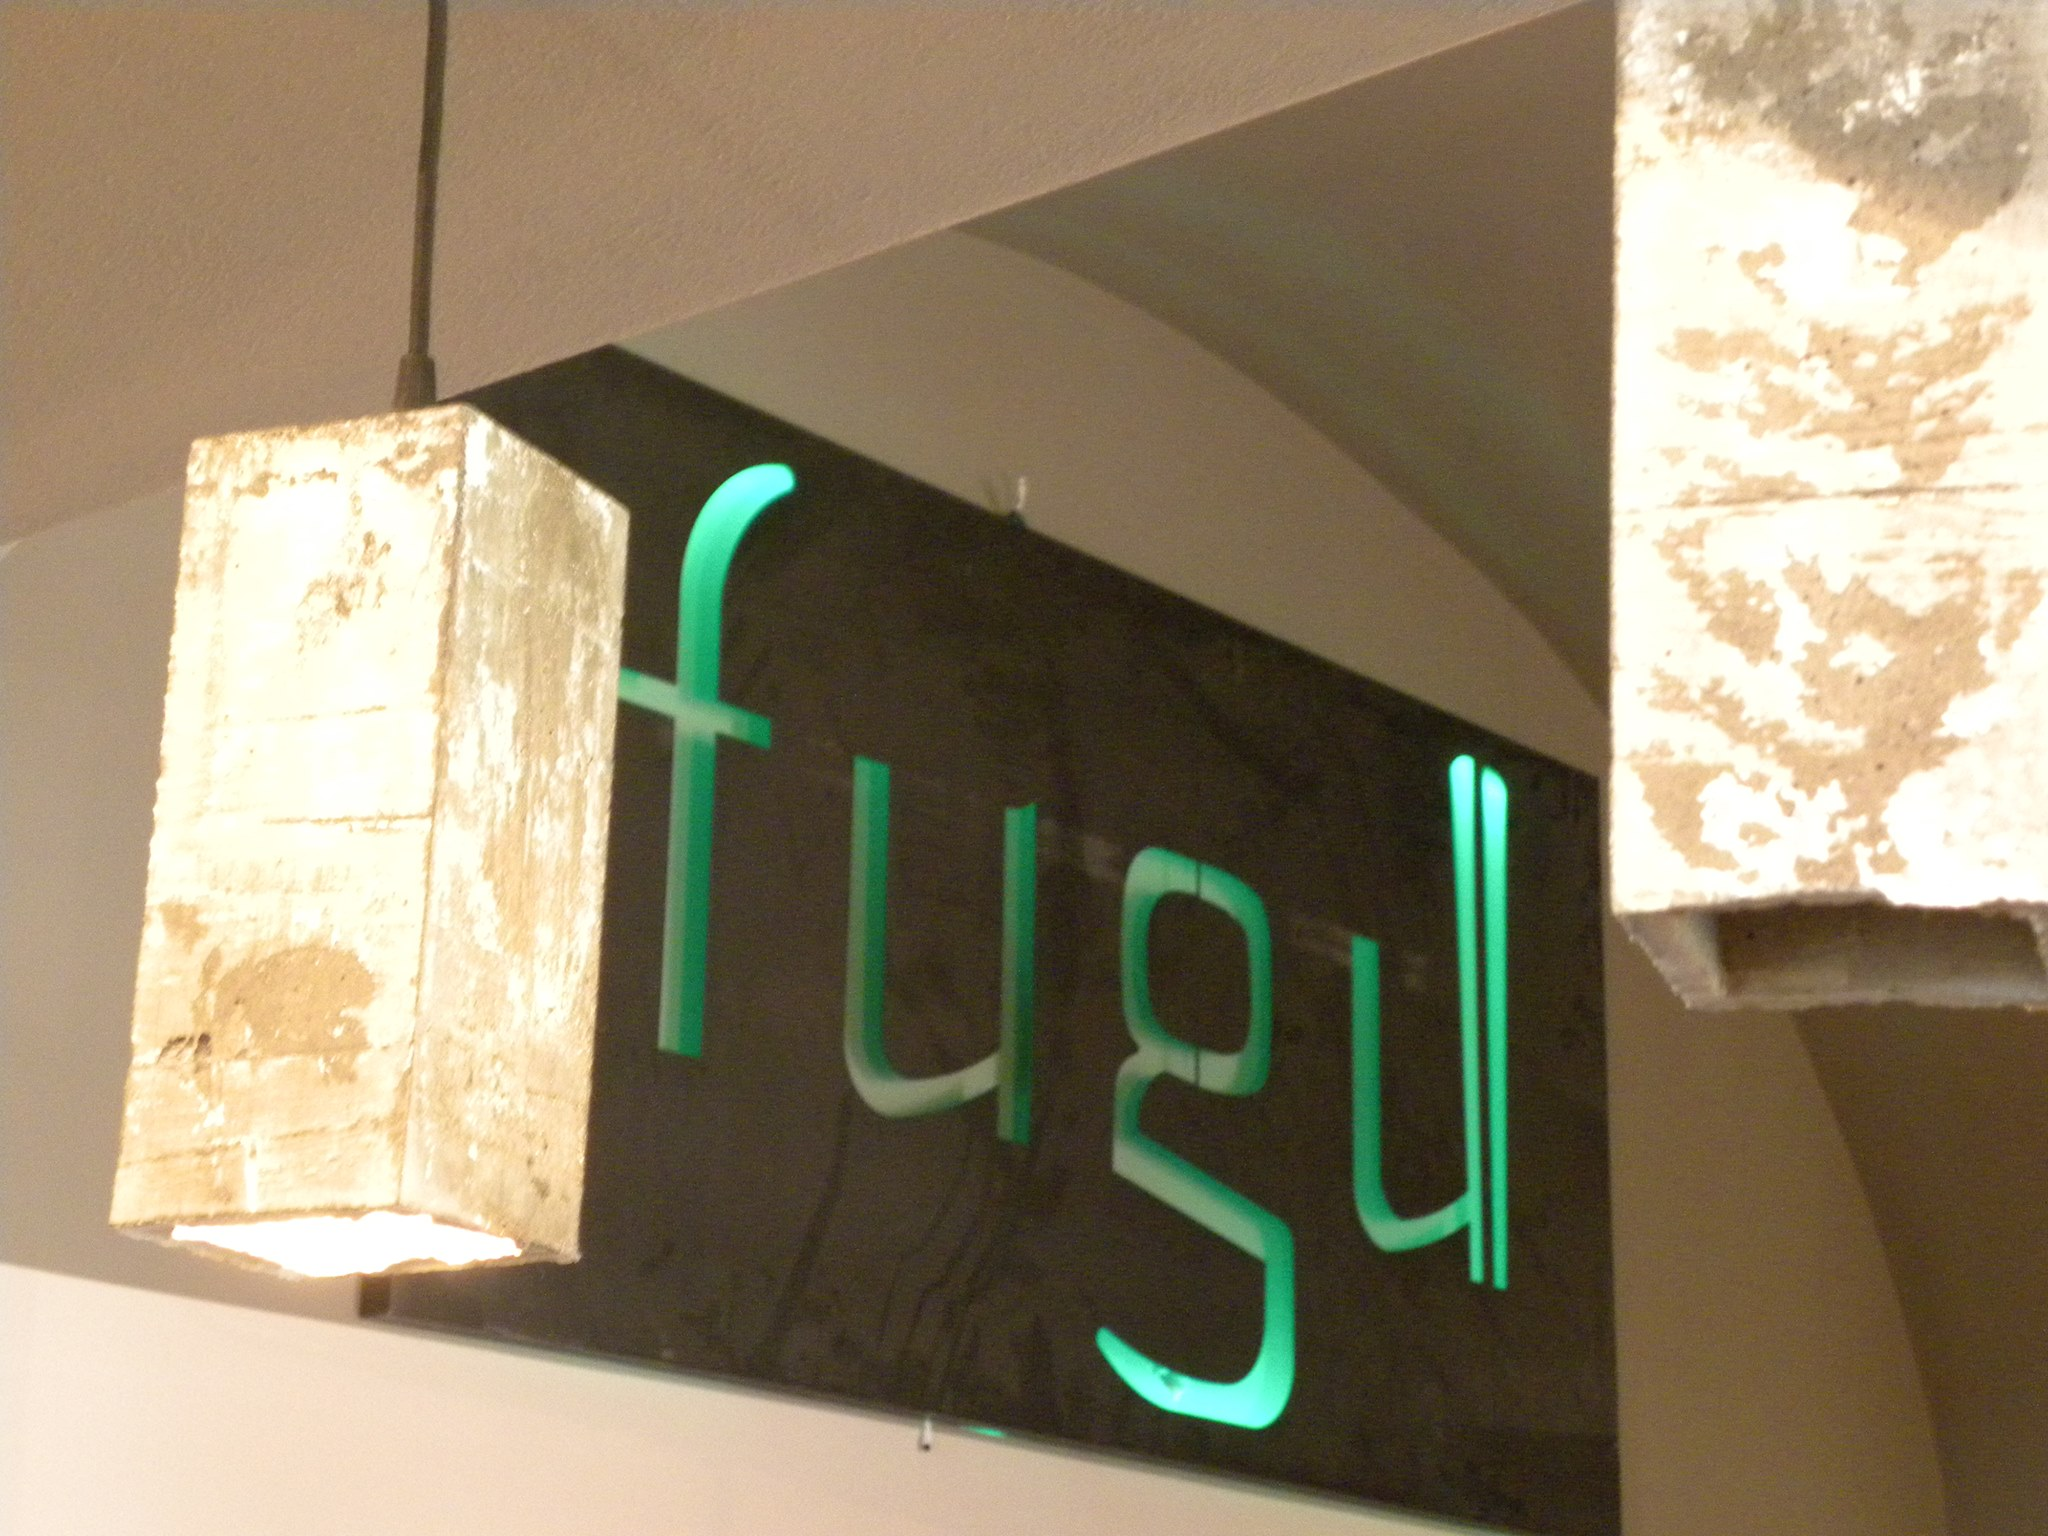 fugu-sushi-iristorante_4.jpg